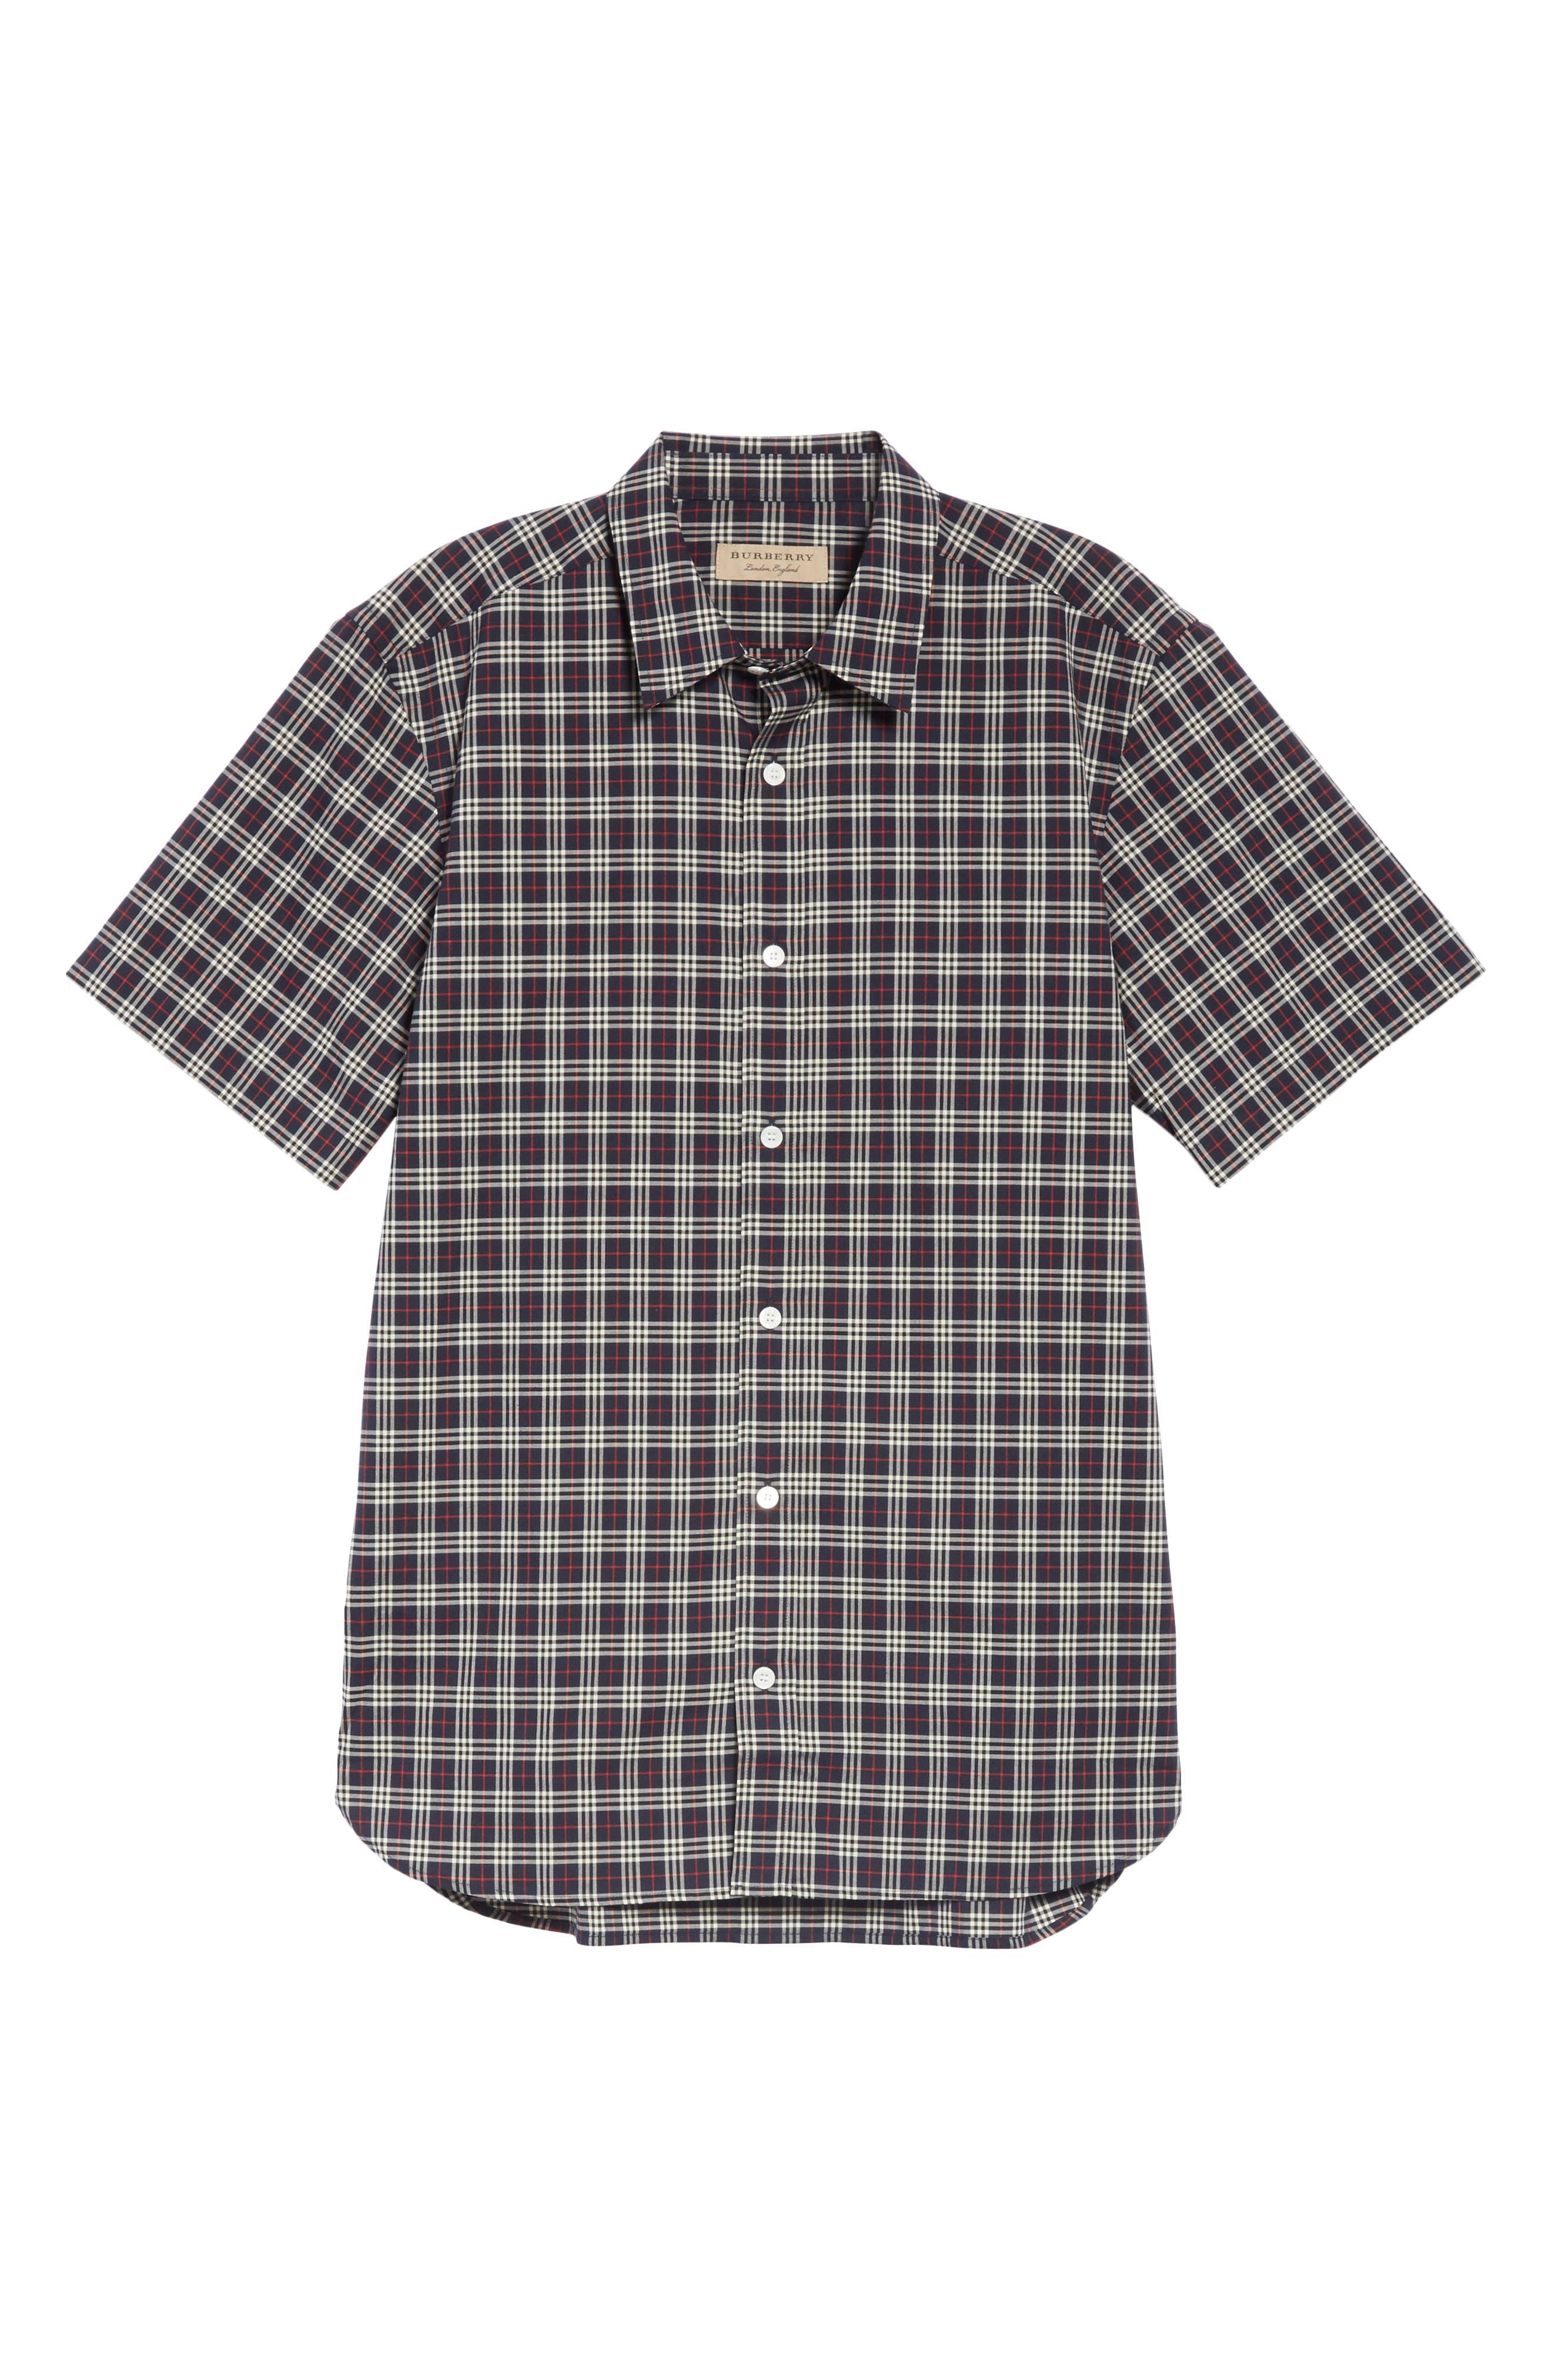 Edward Short Sleeve Shirt,                             Alternate thumbnail 5, color,                             400